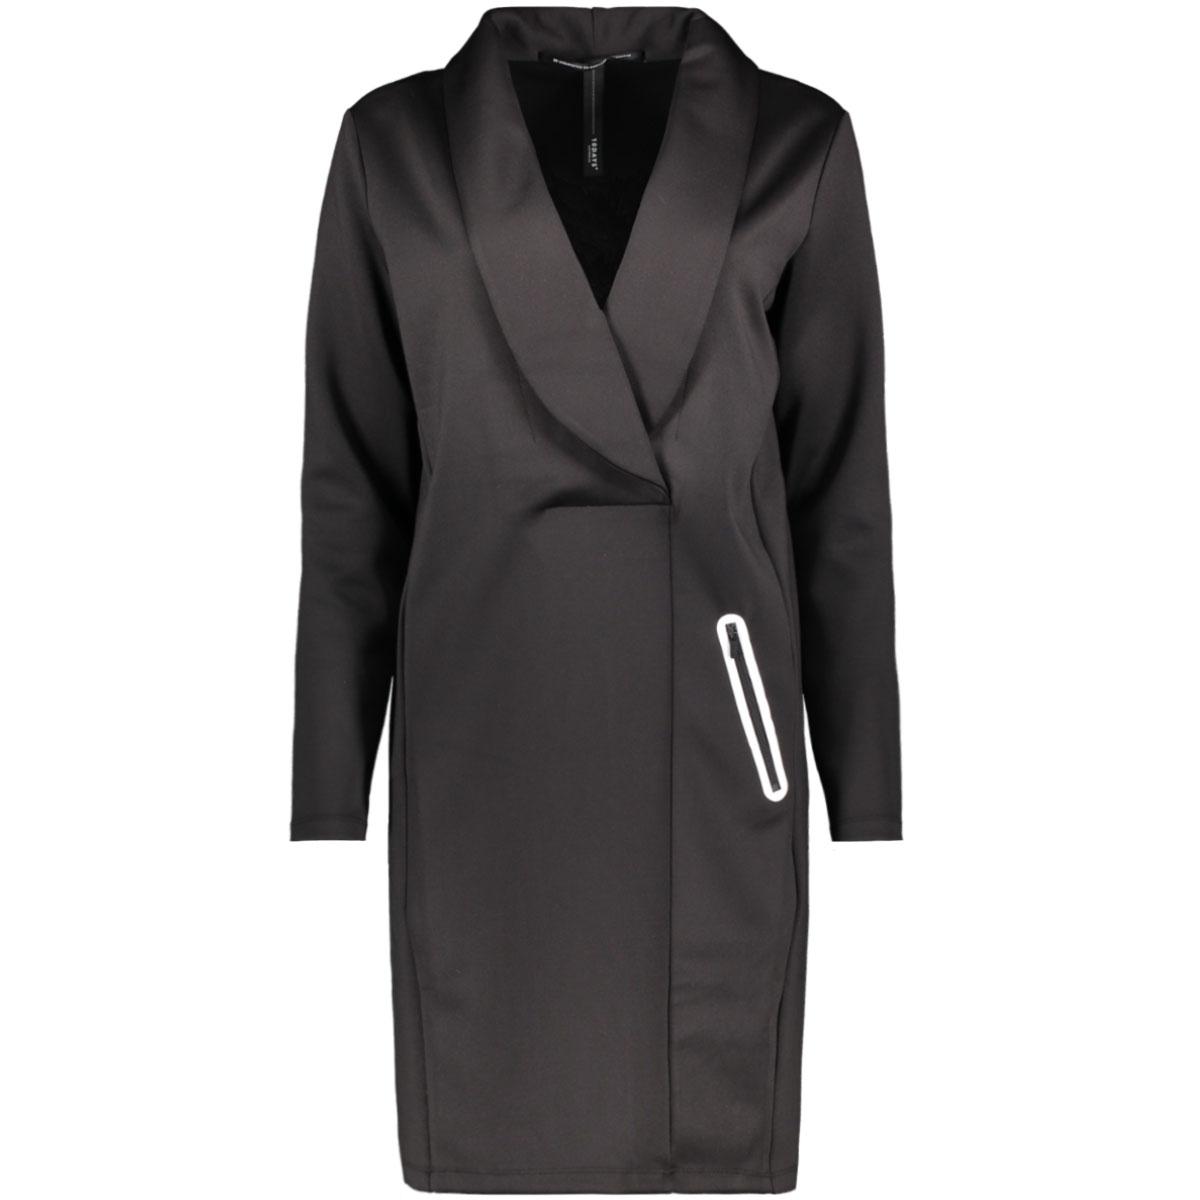 smoking dress 20 335 9103 10 days jurk black